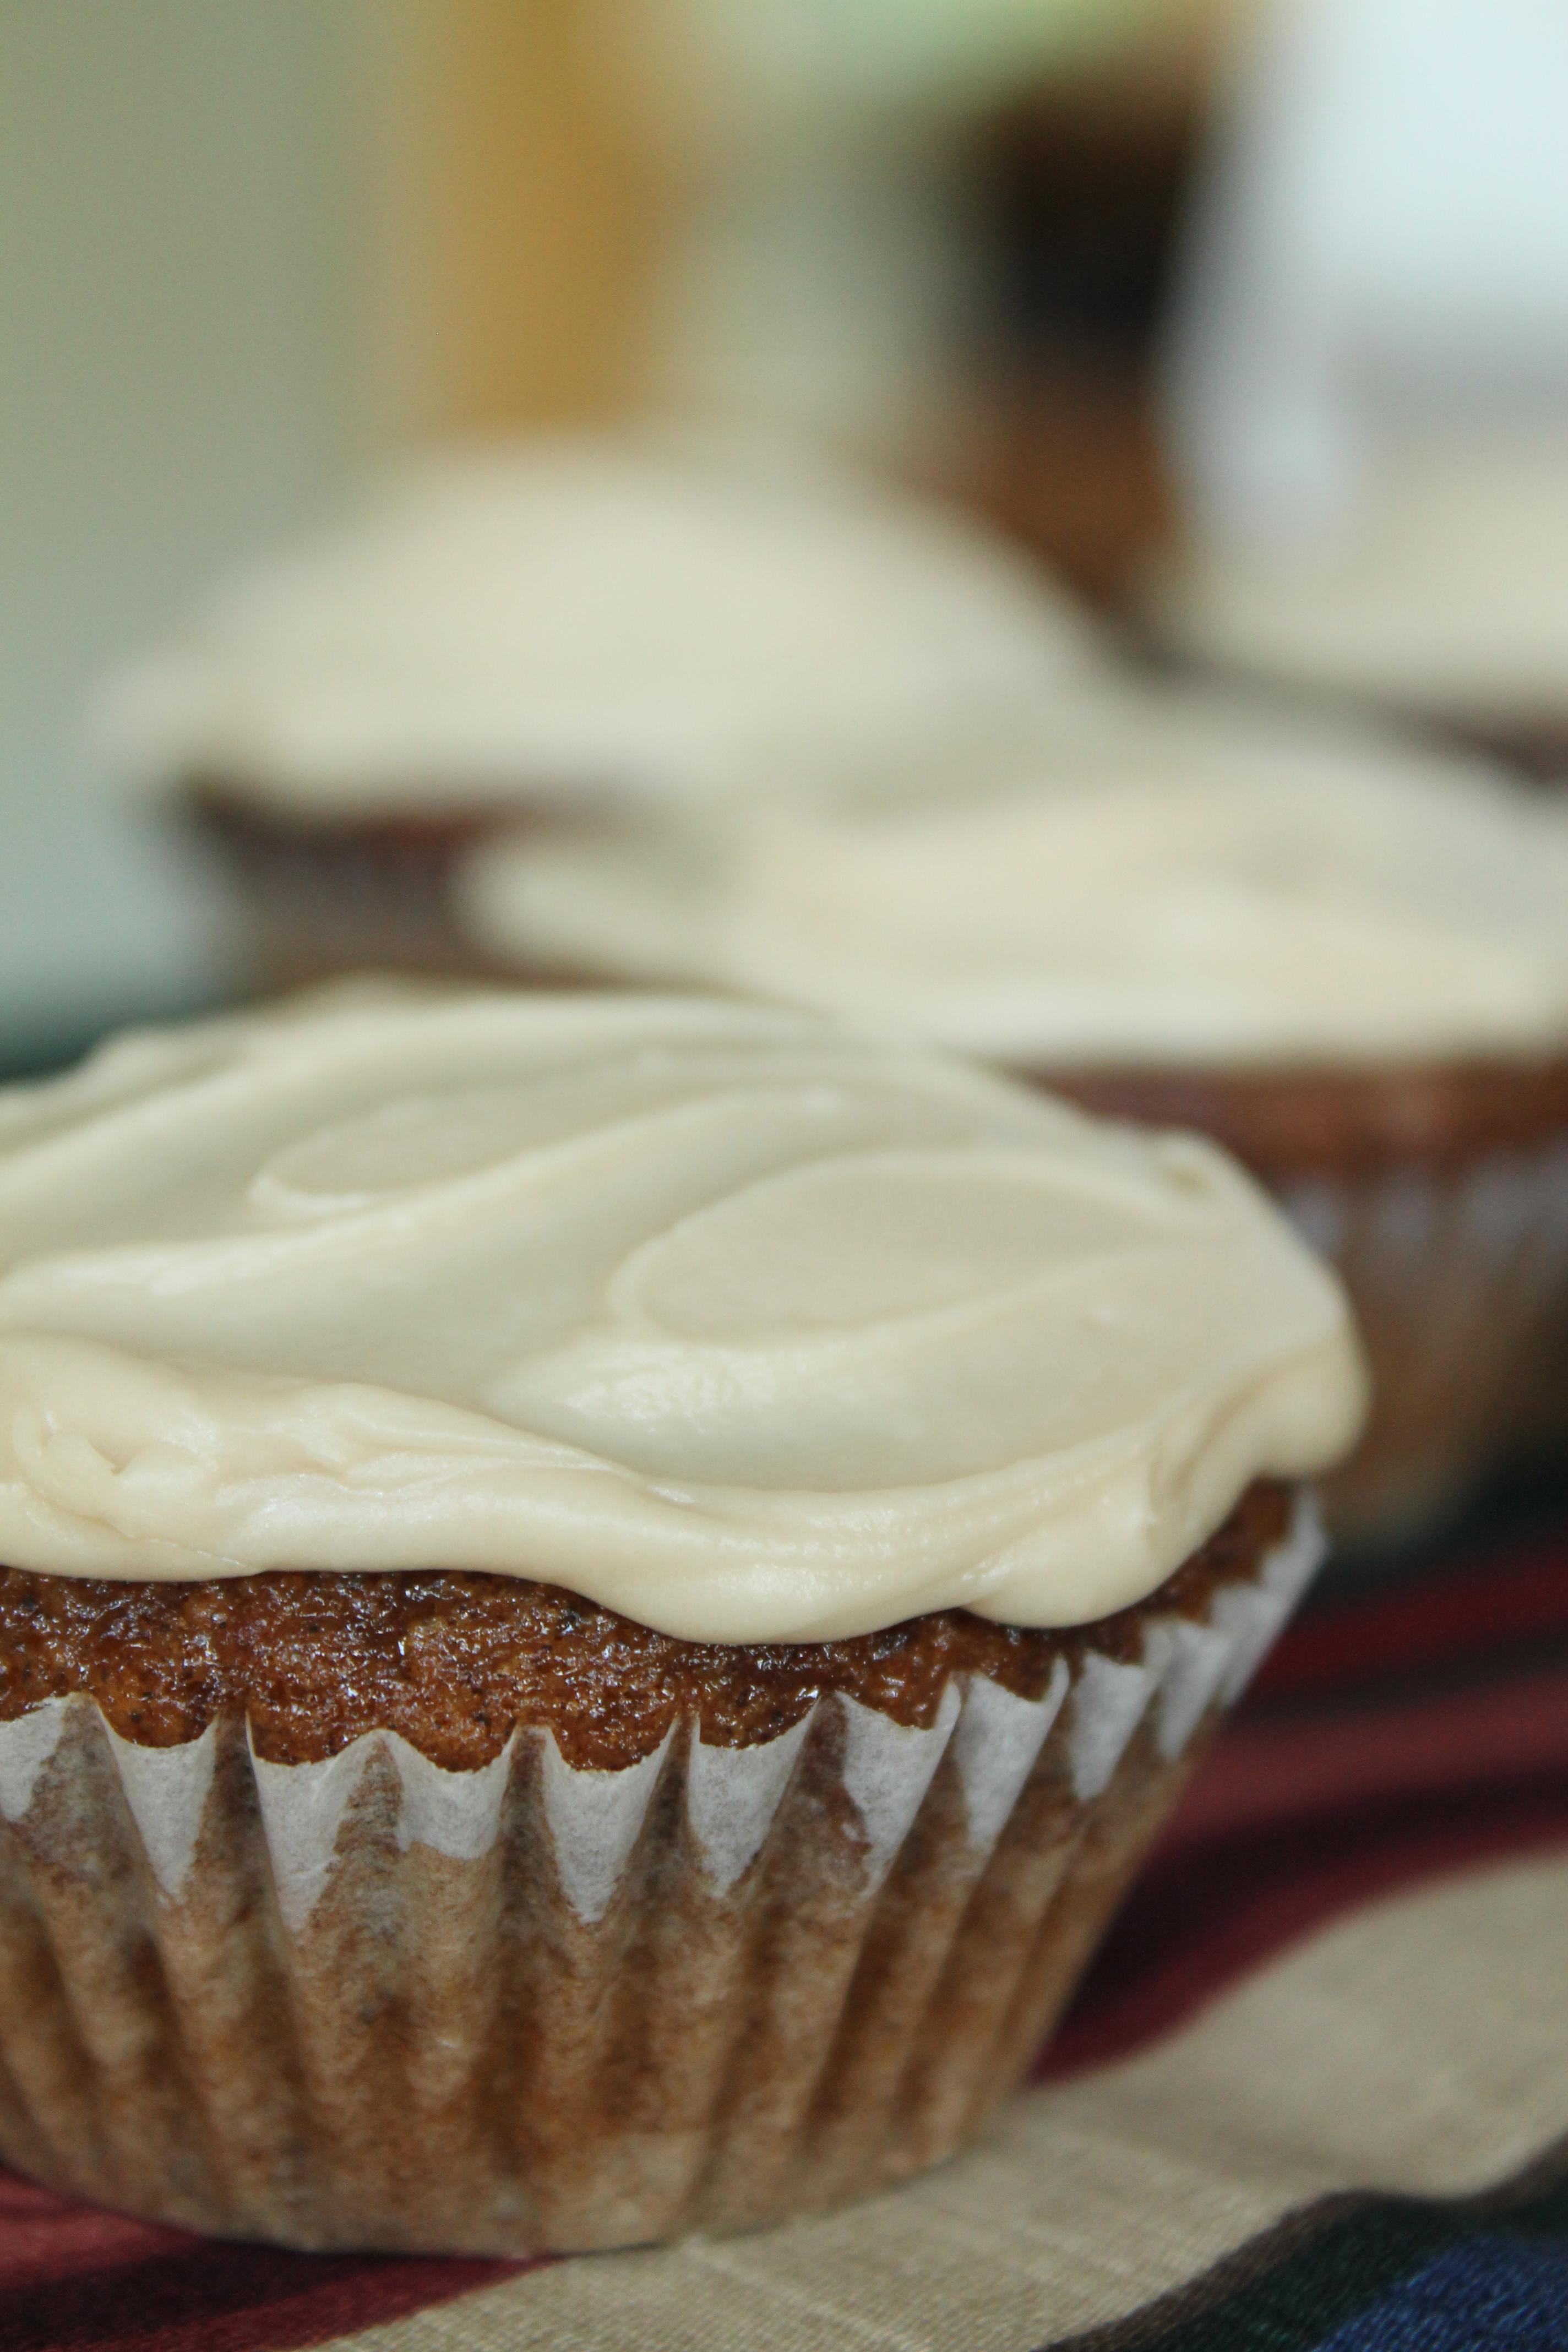 cupcakes pumpkin ale cupcakes for pumpkin ale cupcakes with pumpkin ...